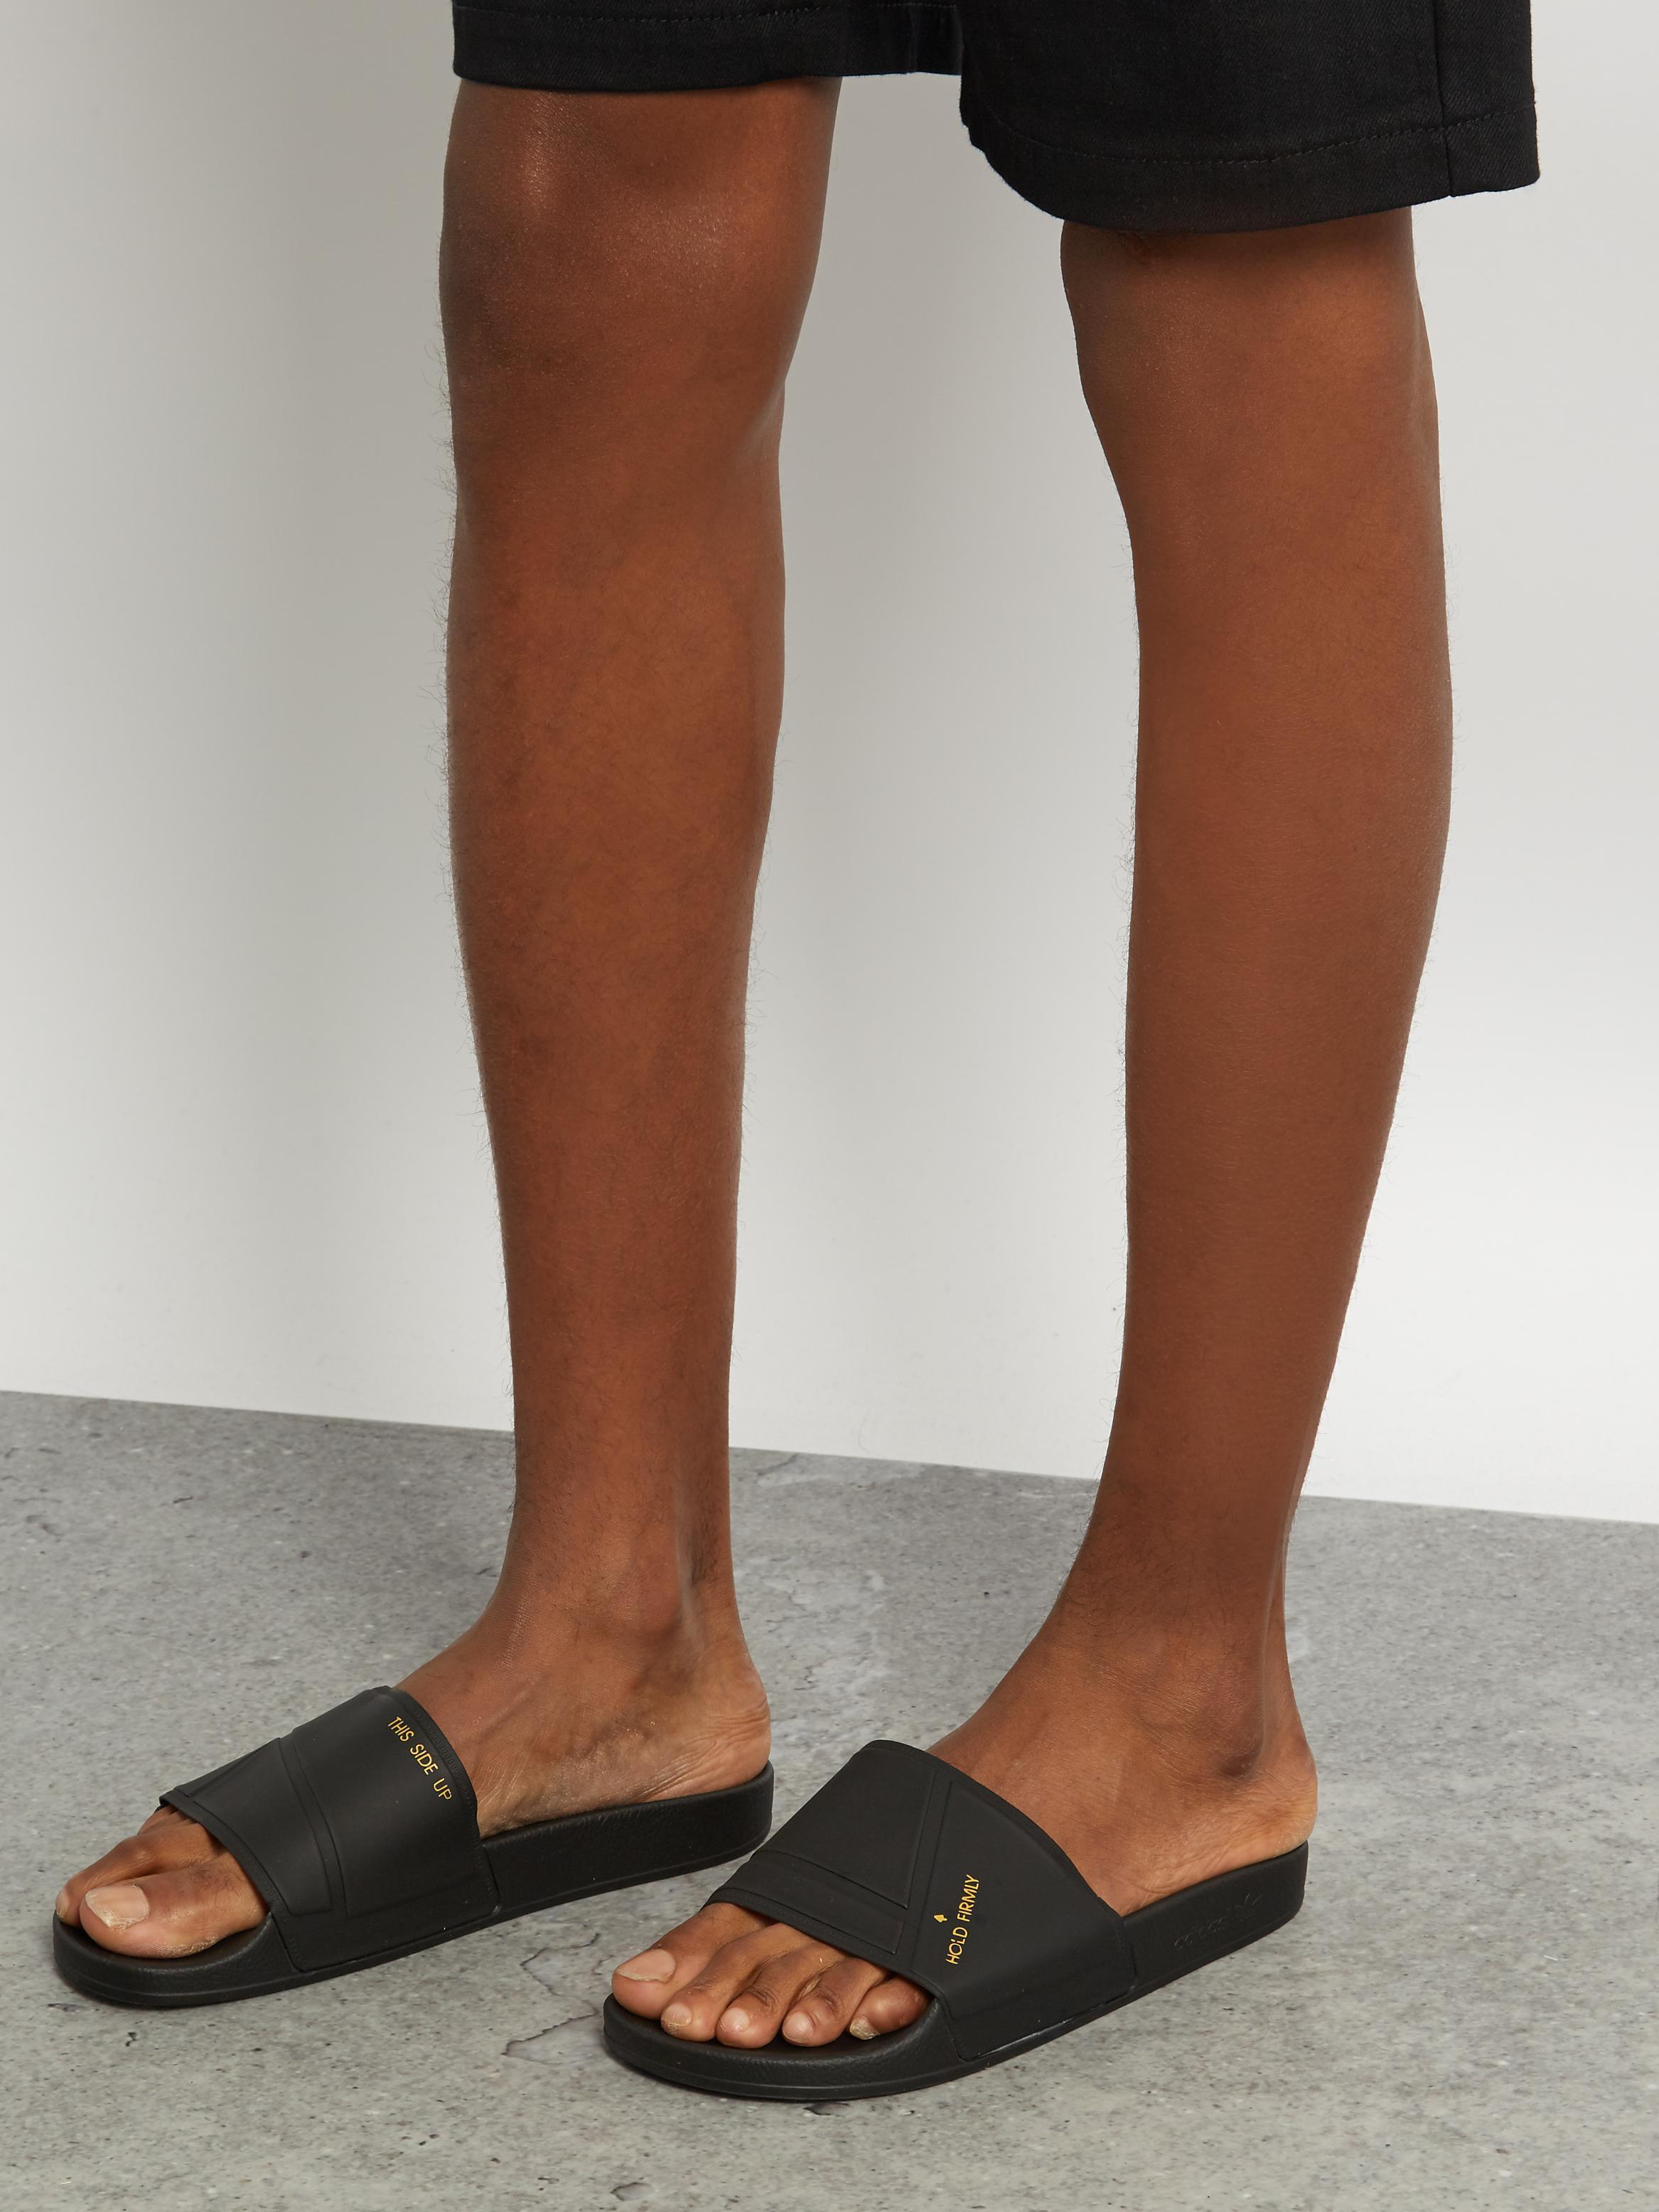 8e0dbe519cdd adidas By Raf Simons Bunny Adilette Pool Slides in Black for Men - Lyst